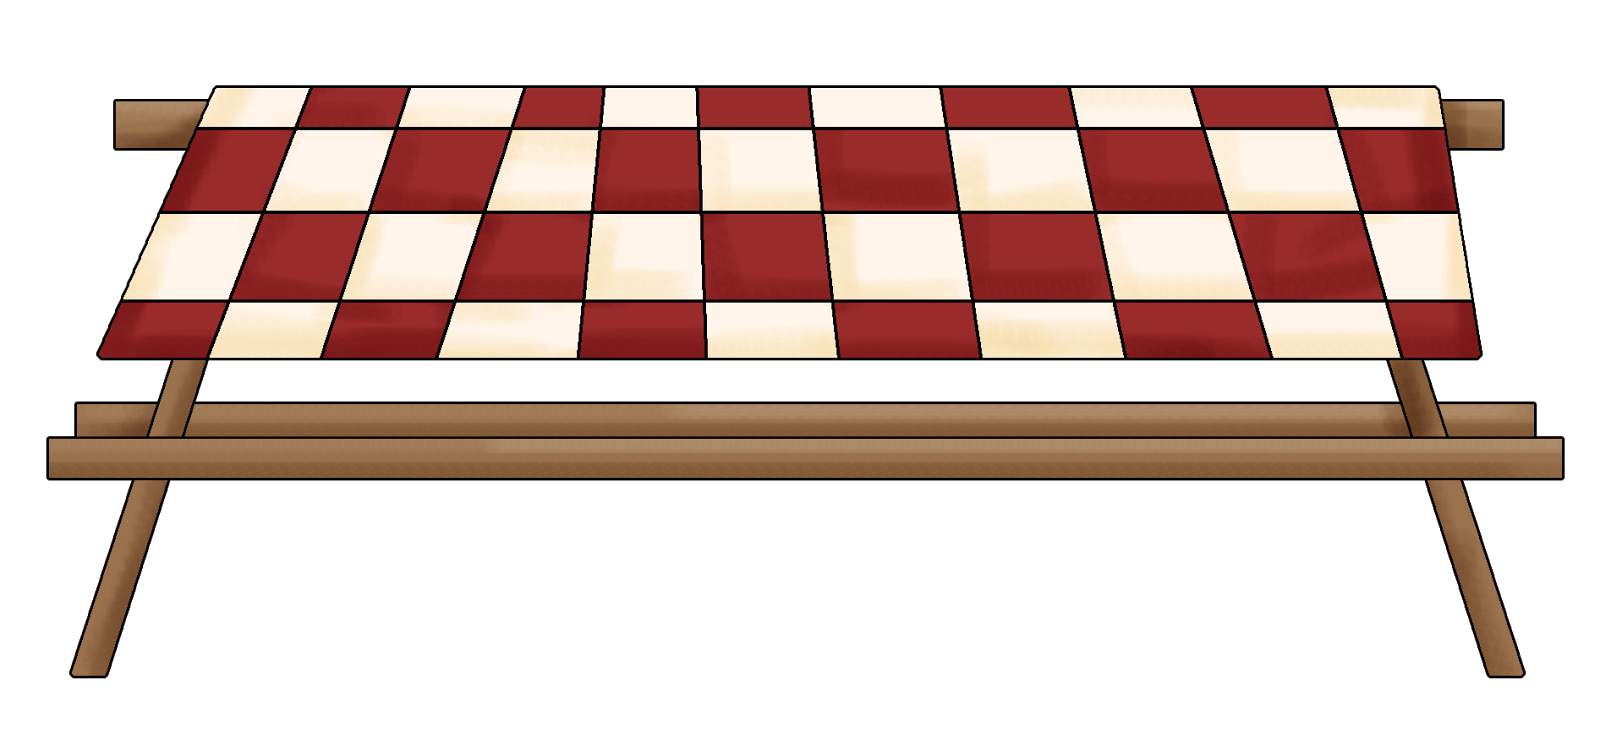 Picnic Table Clip Art Cartoon Picnic Table -...